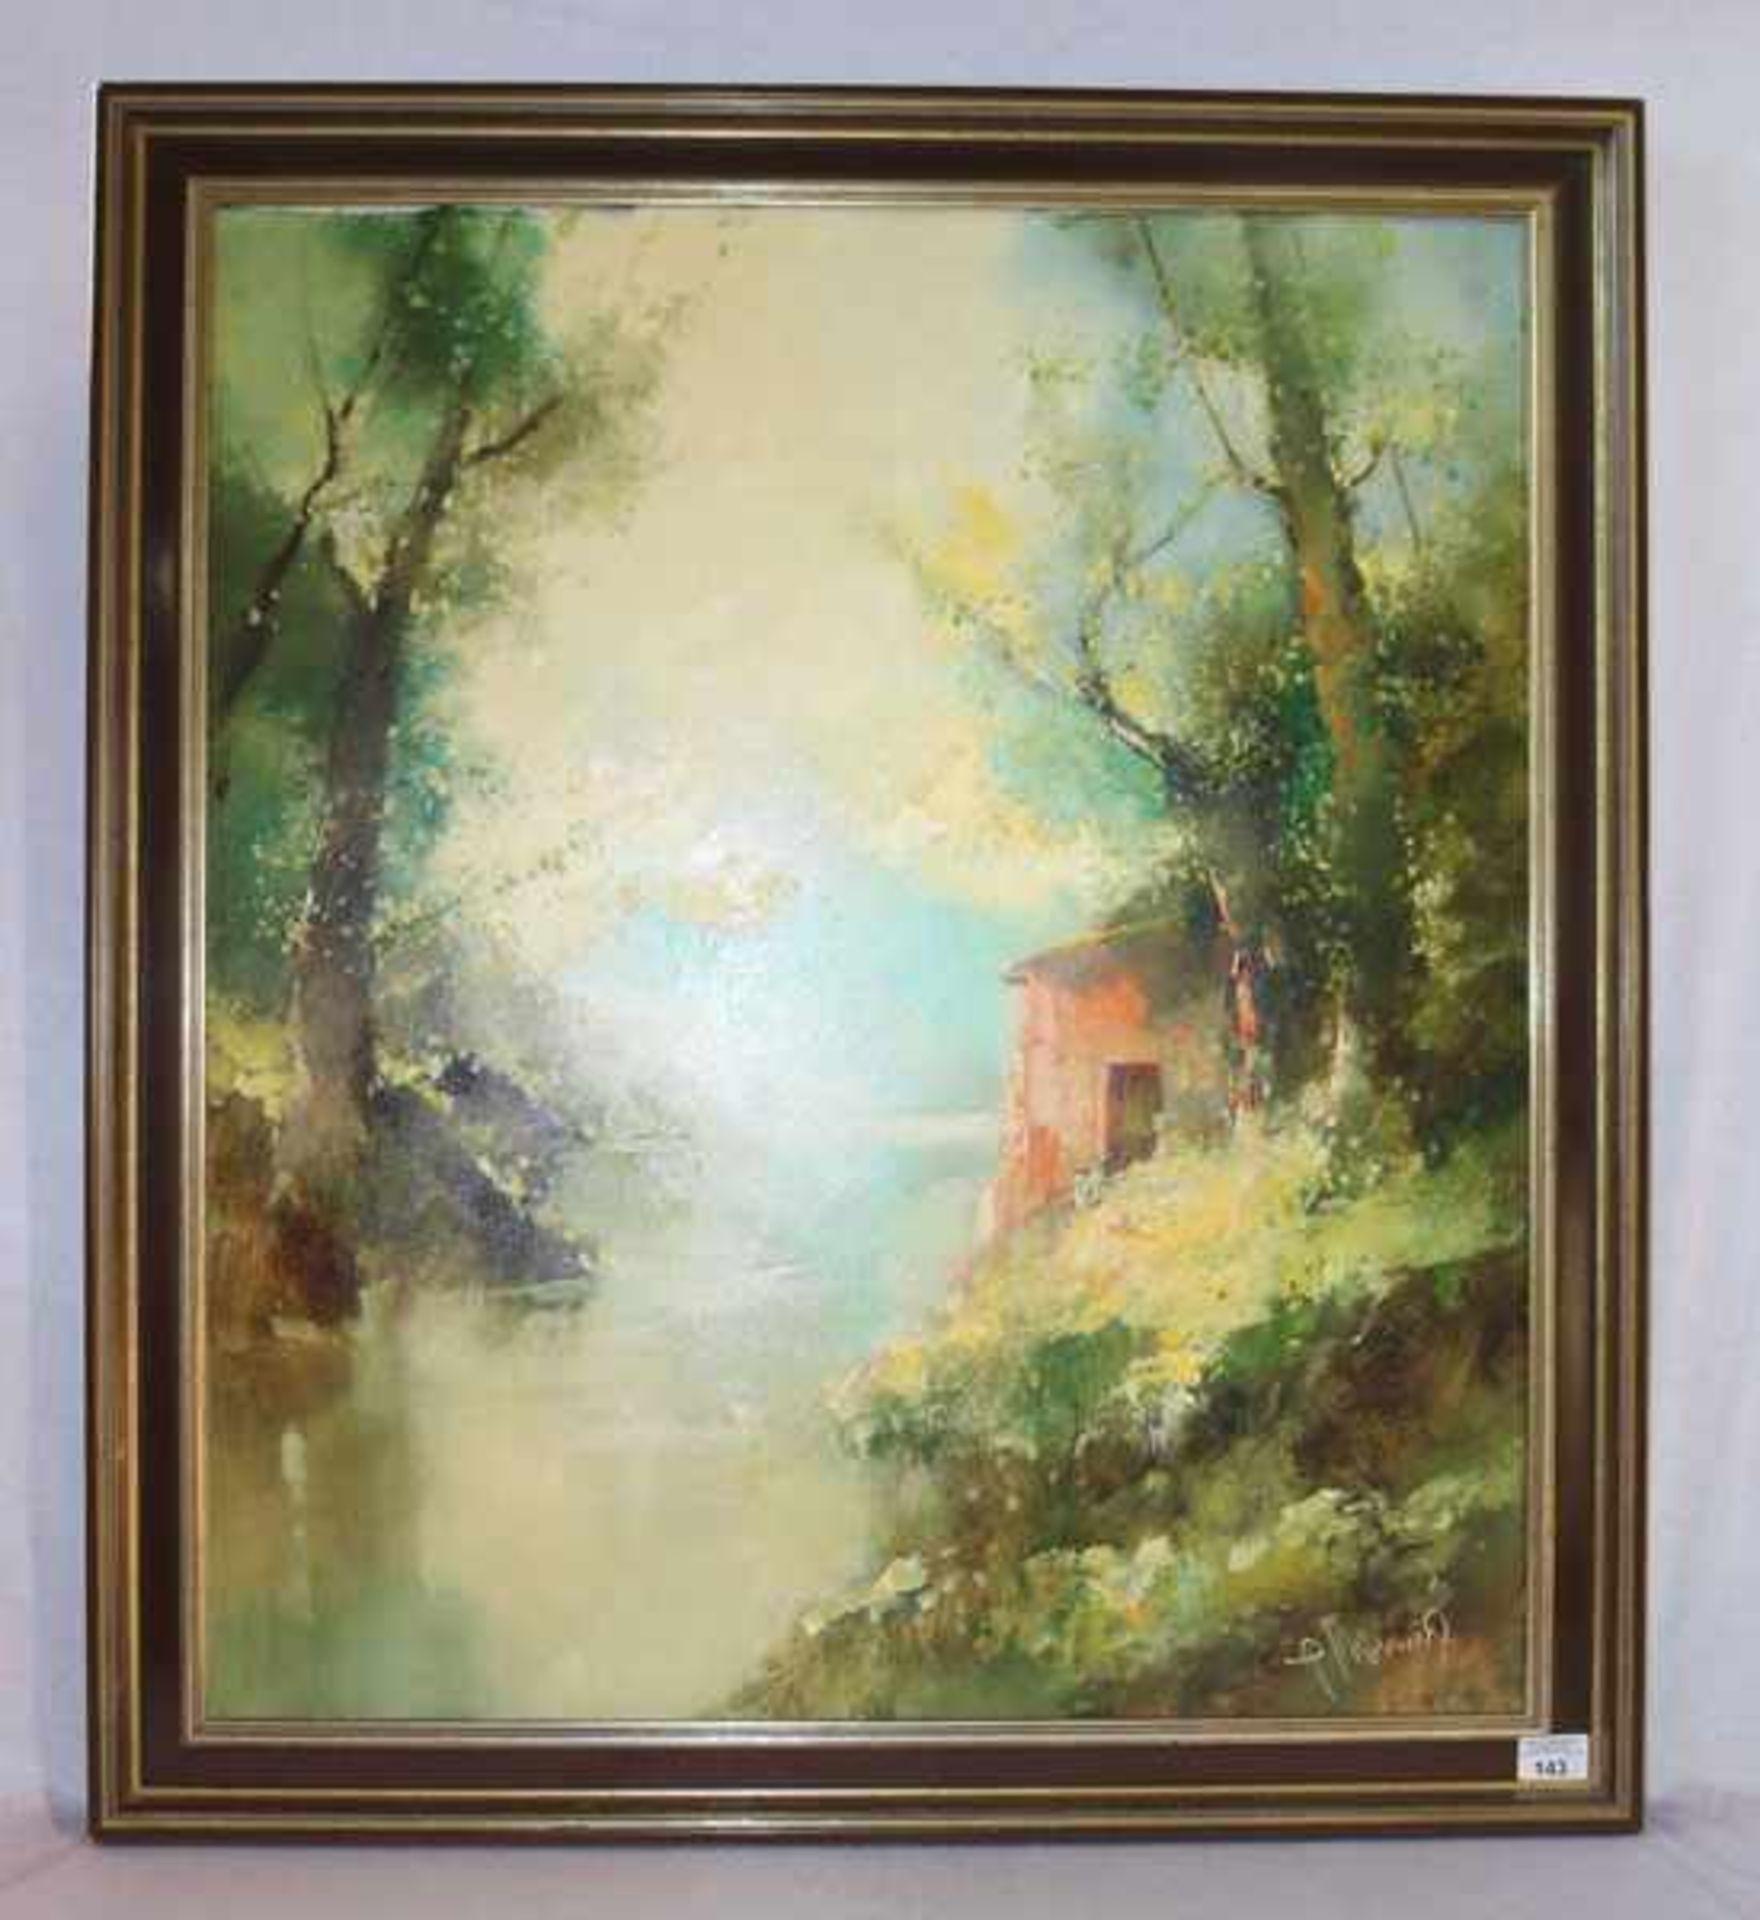 Los 143 - Gemälde ÖL/LW 'Landschafts-Szenerie mit Haus am See', signiert P. Morrò, (Ingfried Henze) + 1925